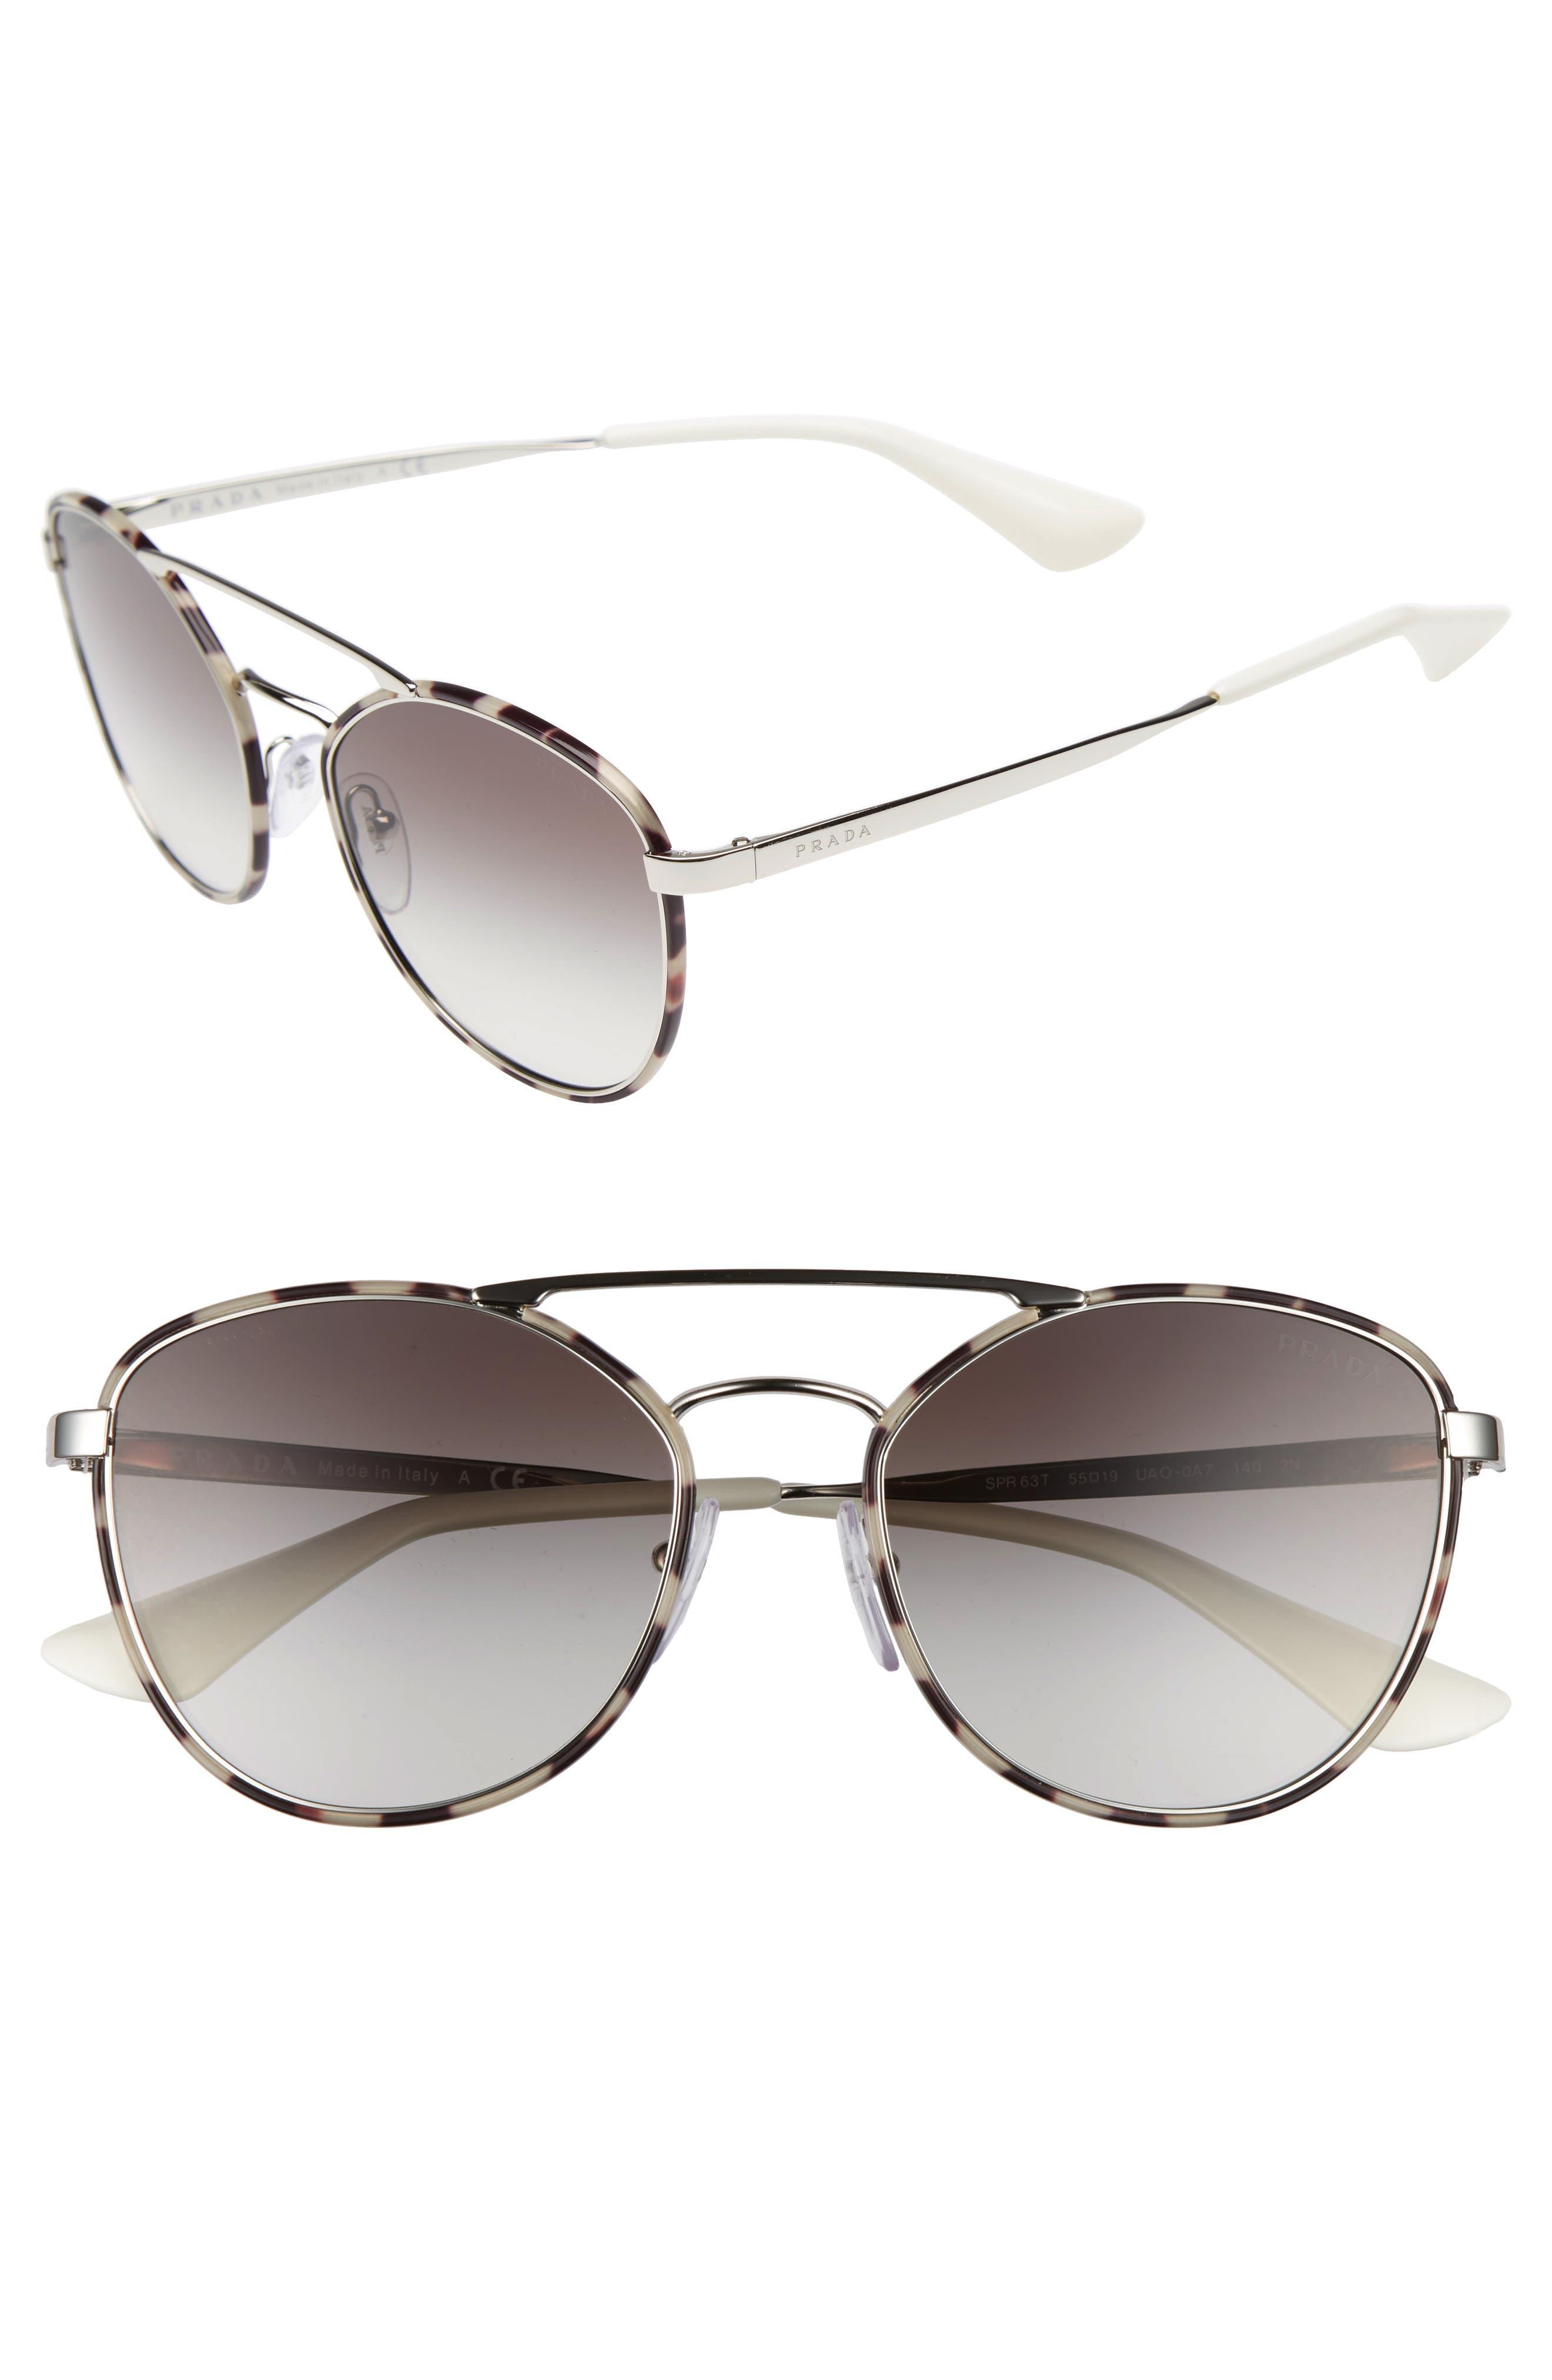 55mm Gradient Aviator Sunglasses,                         Main,                         color, 200